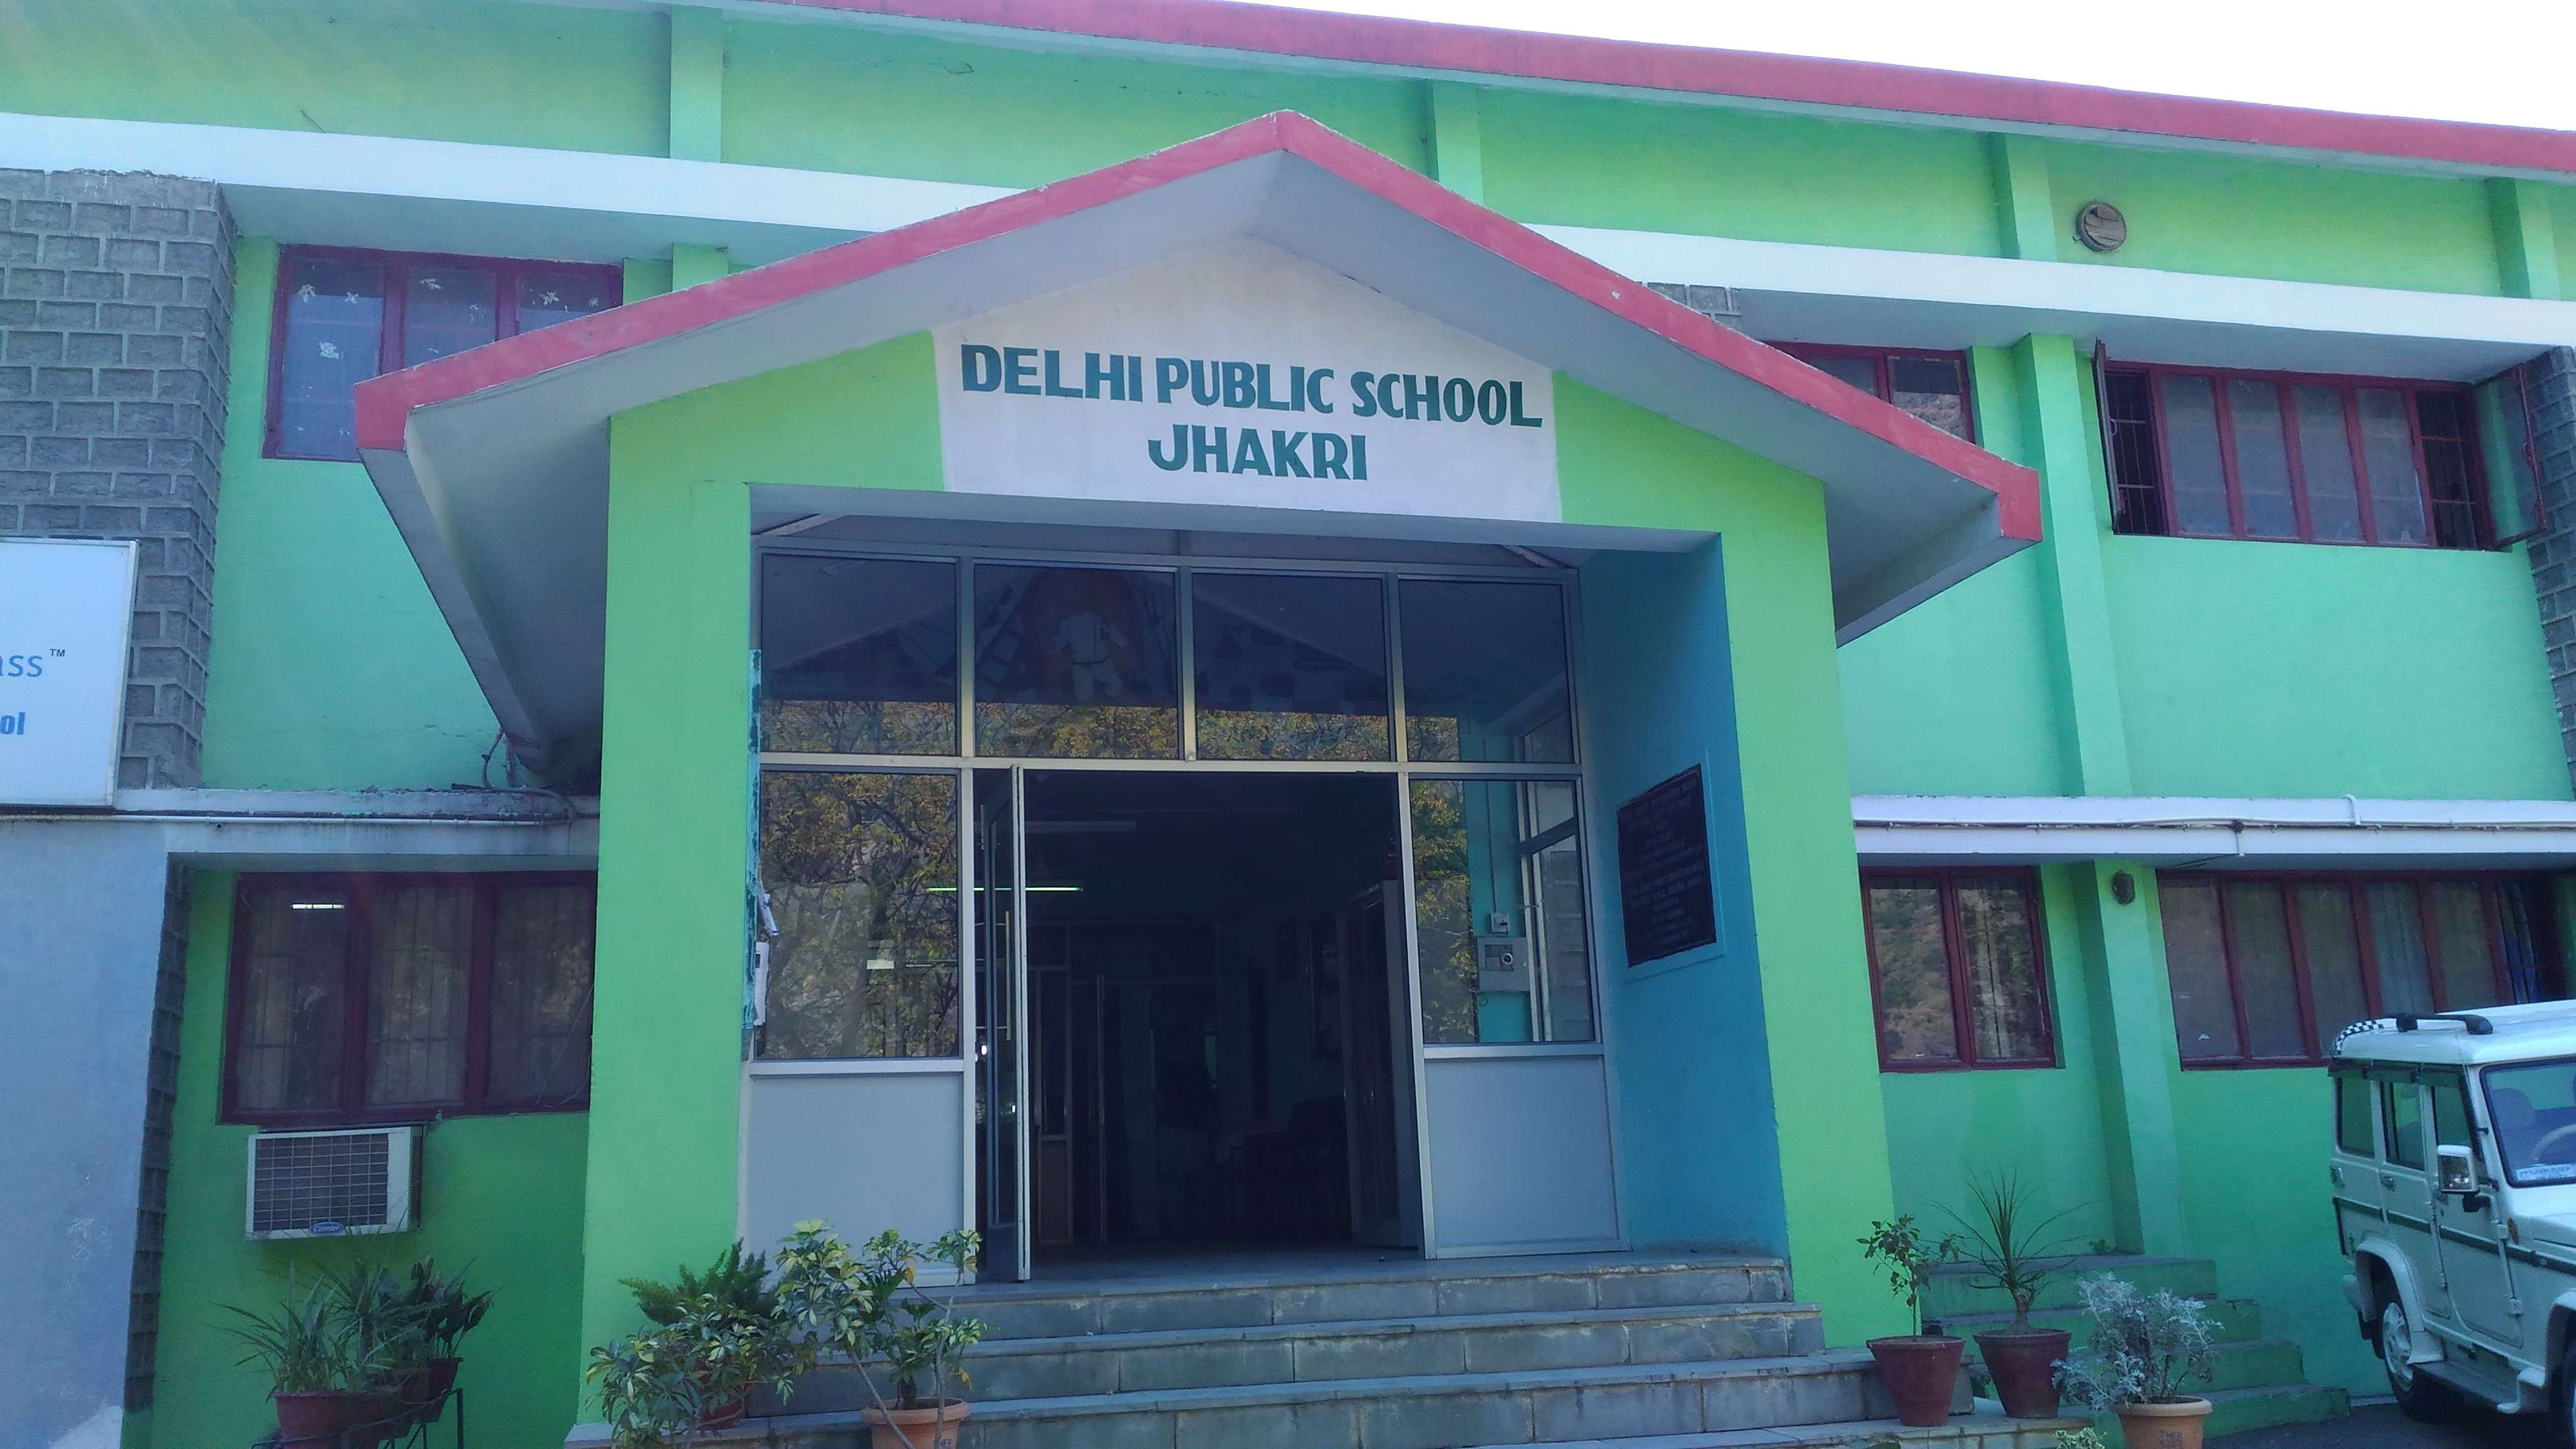 DELHI PUBLIC SCHOOL N J P C JHAKRI RAMPUR BUSHAR DISTT SHIMLA HIMACHAL PRADESH 630050